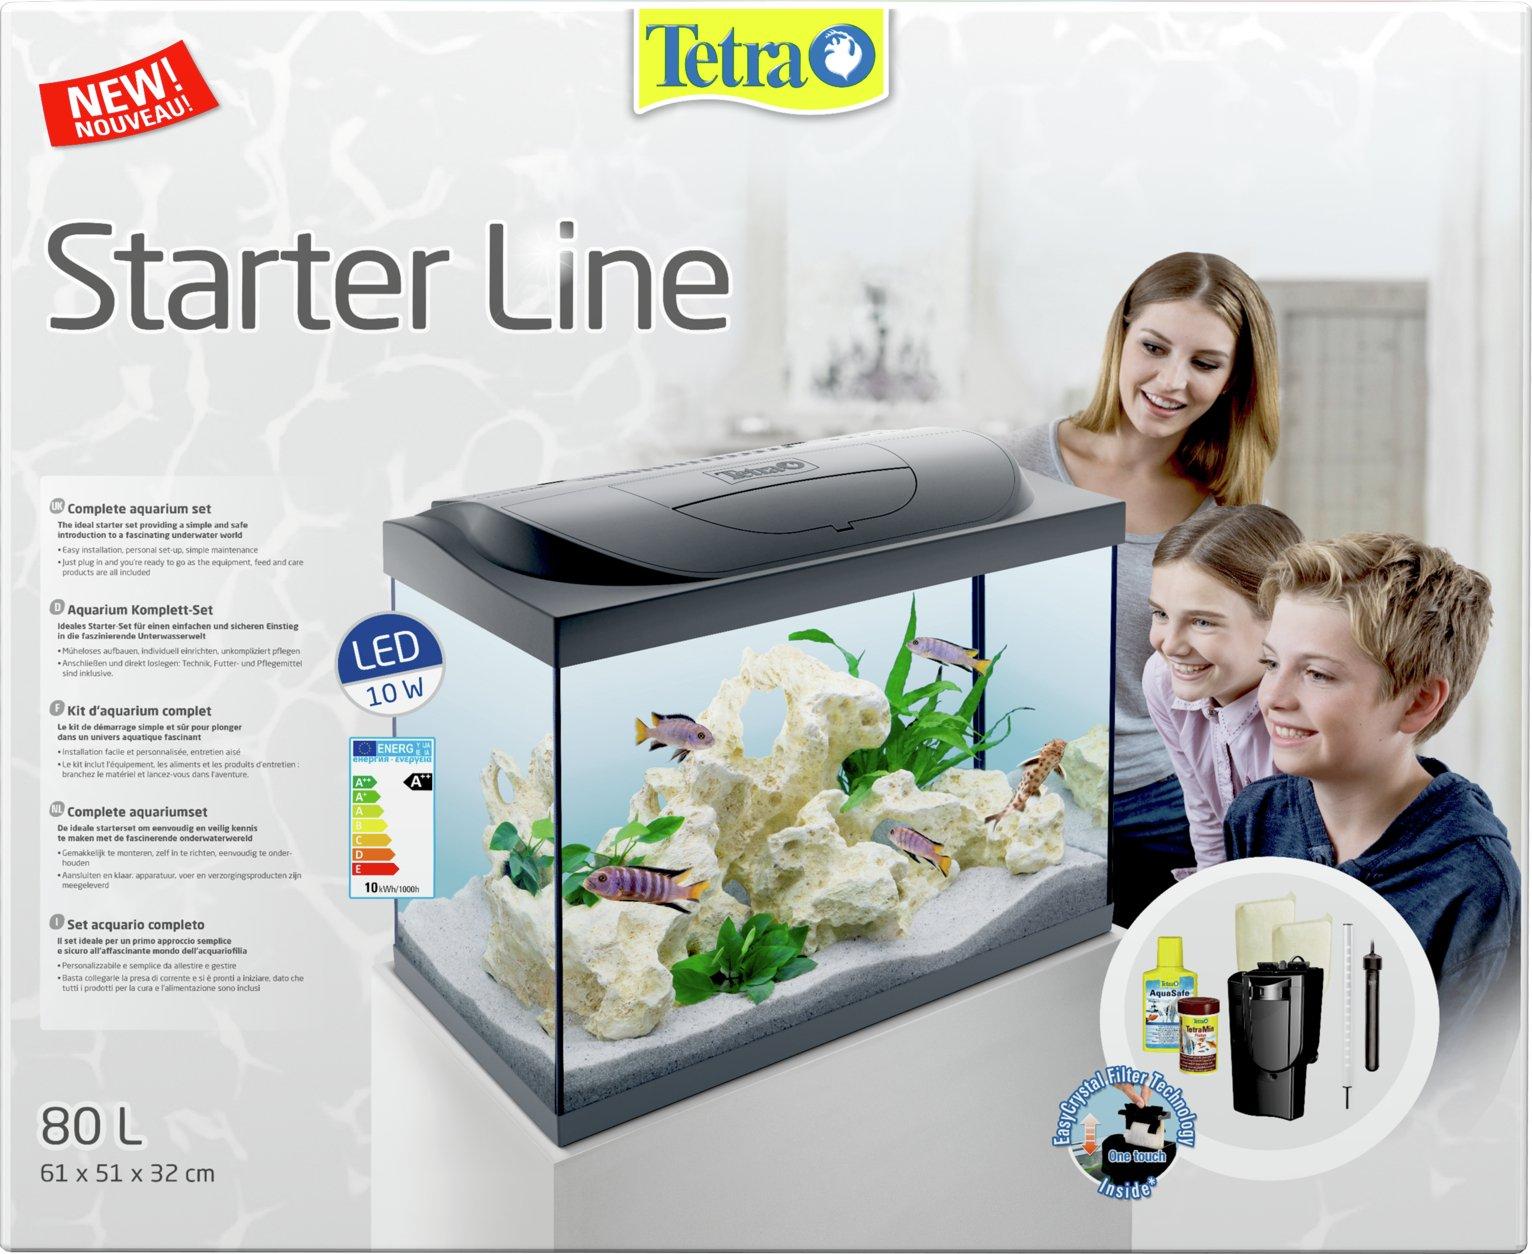 Tetra 80 Litre Starter Kit review